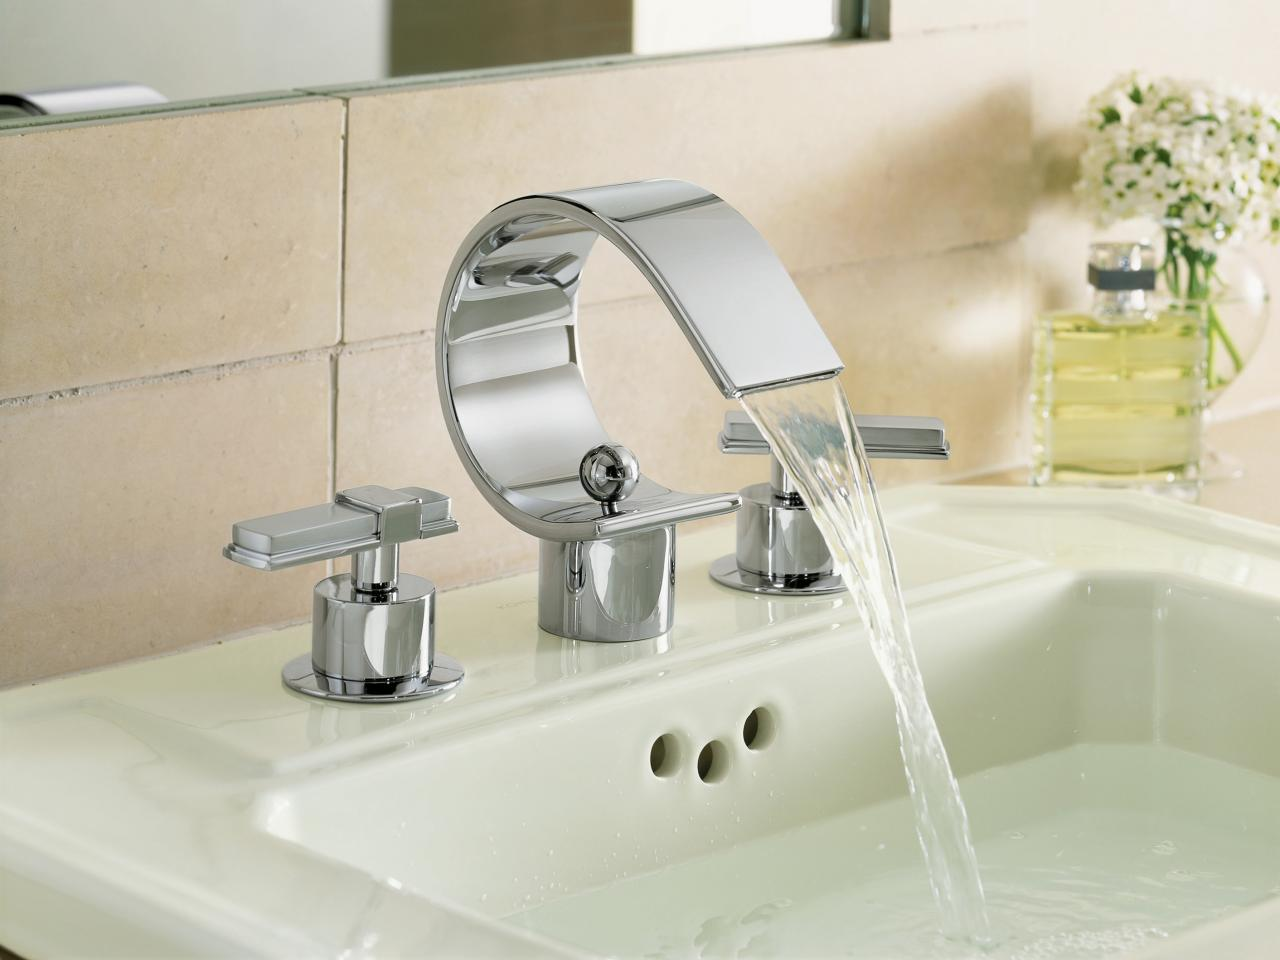 spa bathroom fixtures photo - 3